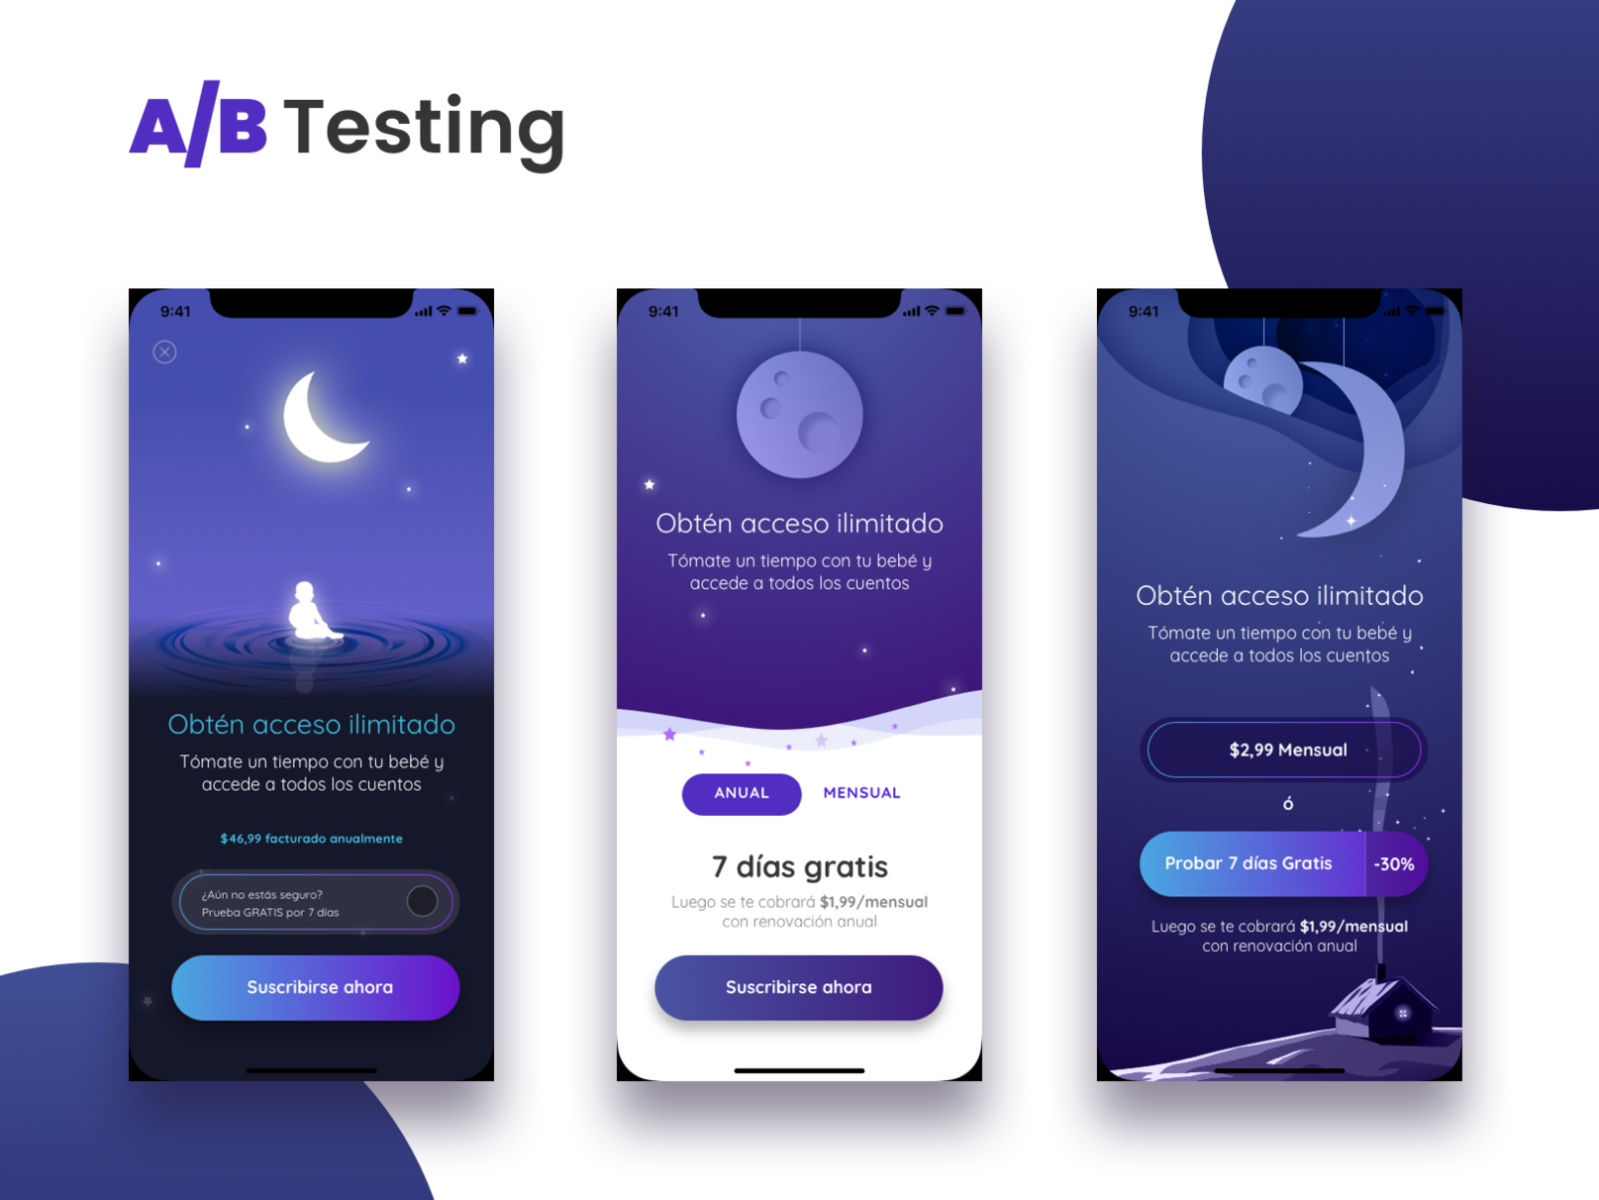 App a/b testing